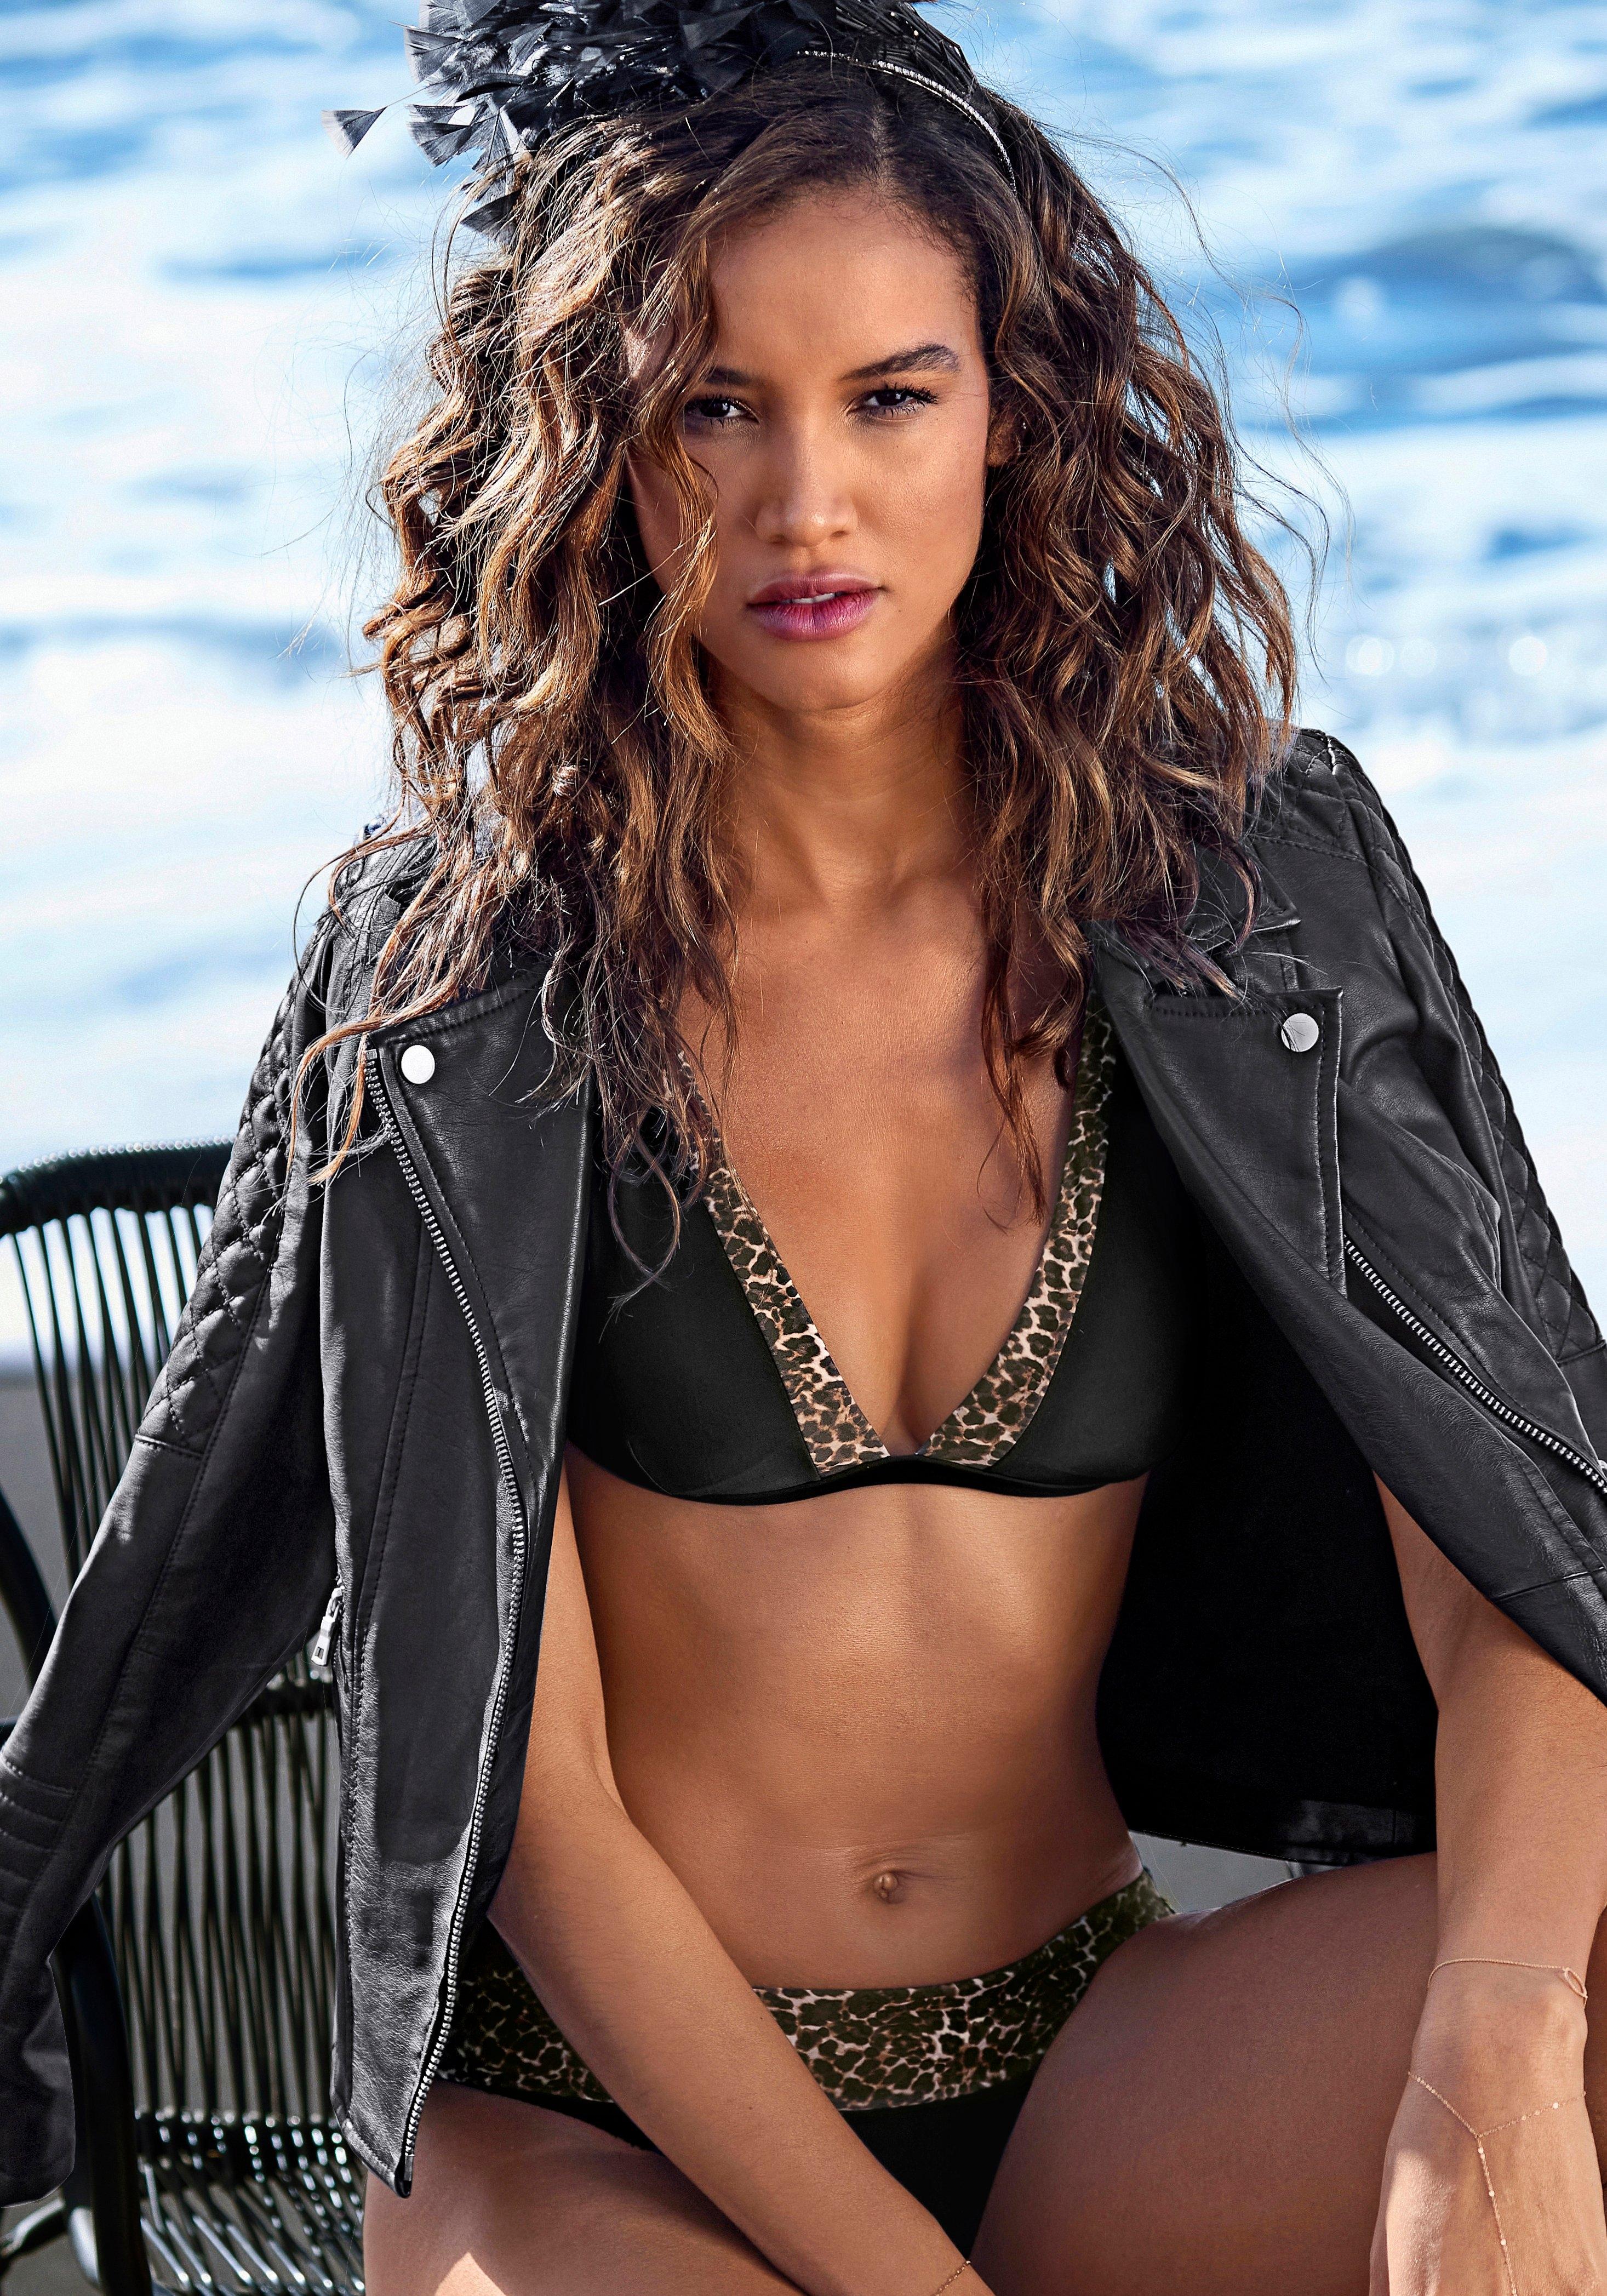 Lascana bikinibroekje ADELE met trendy details bij Lascana online kopen